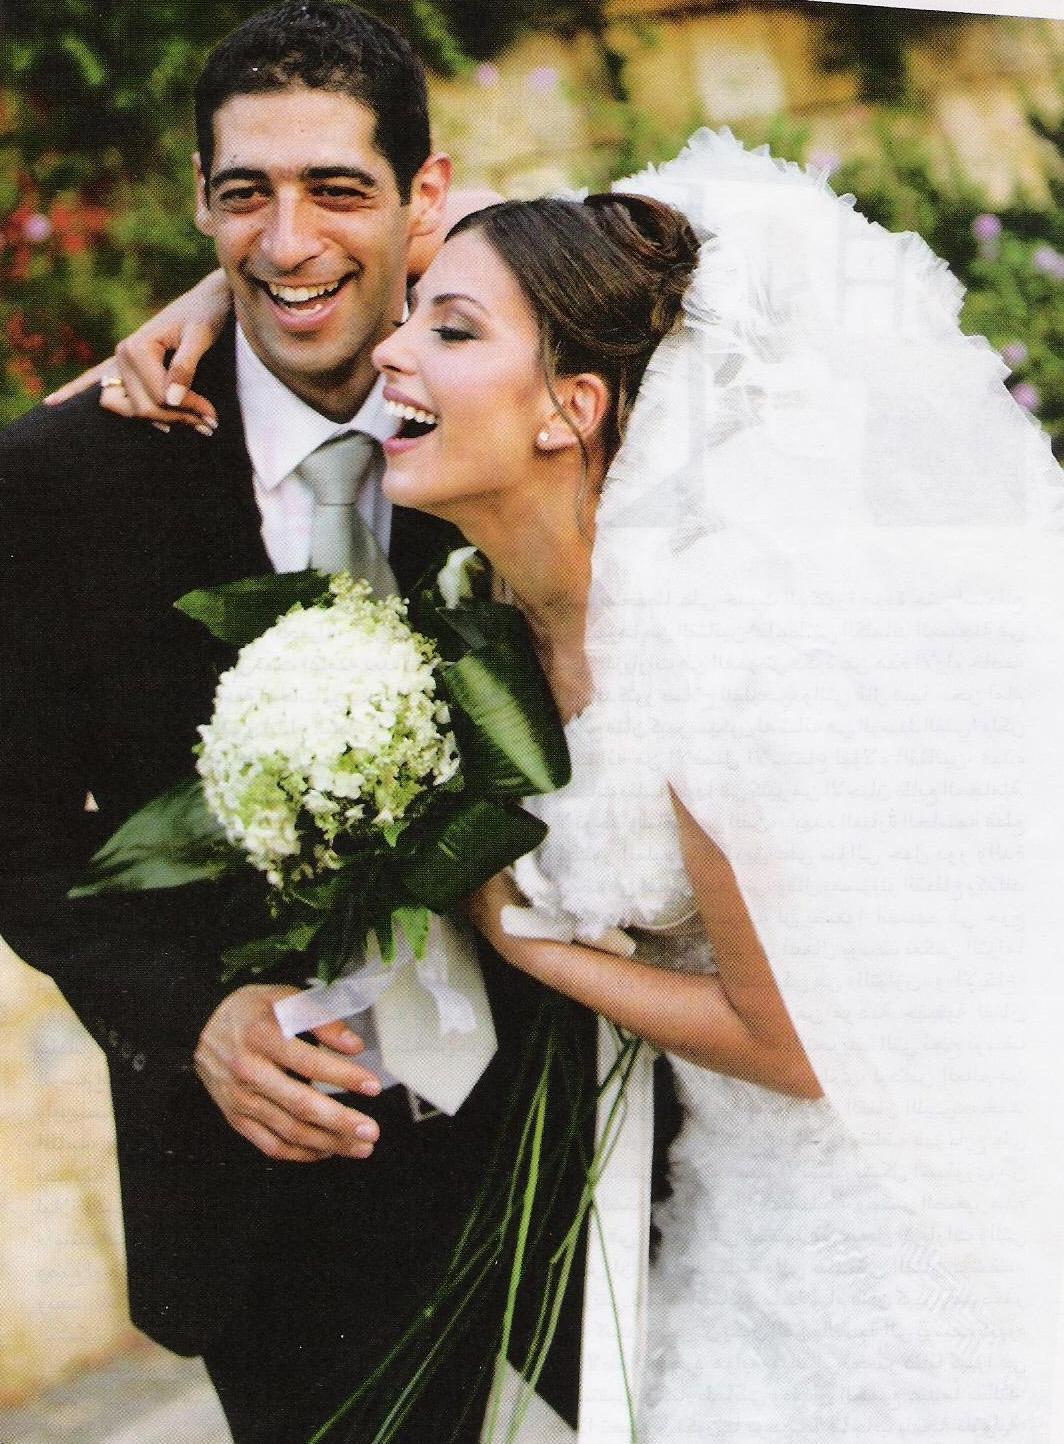 Pin Anabella Hilal Wedding Kootationcom on Pinterest